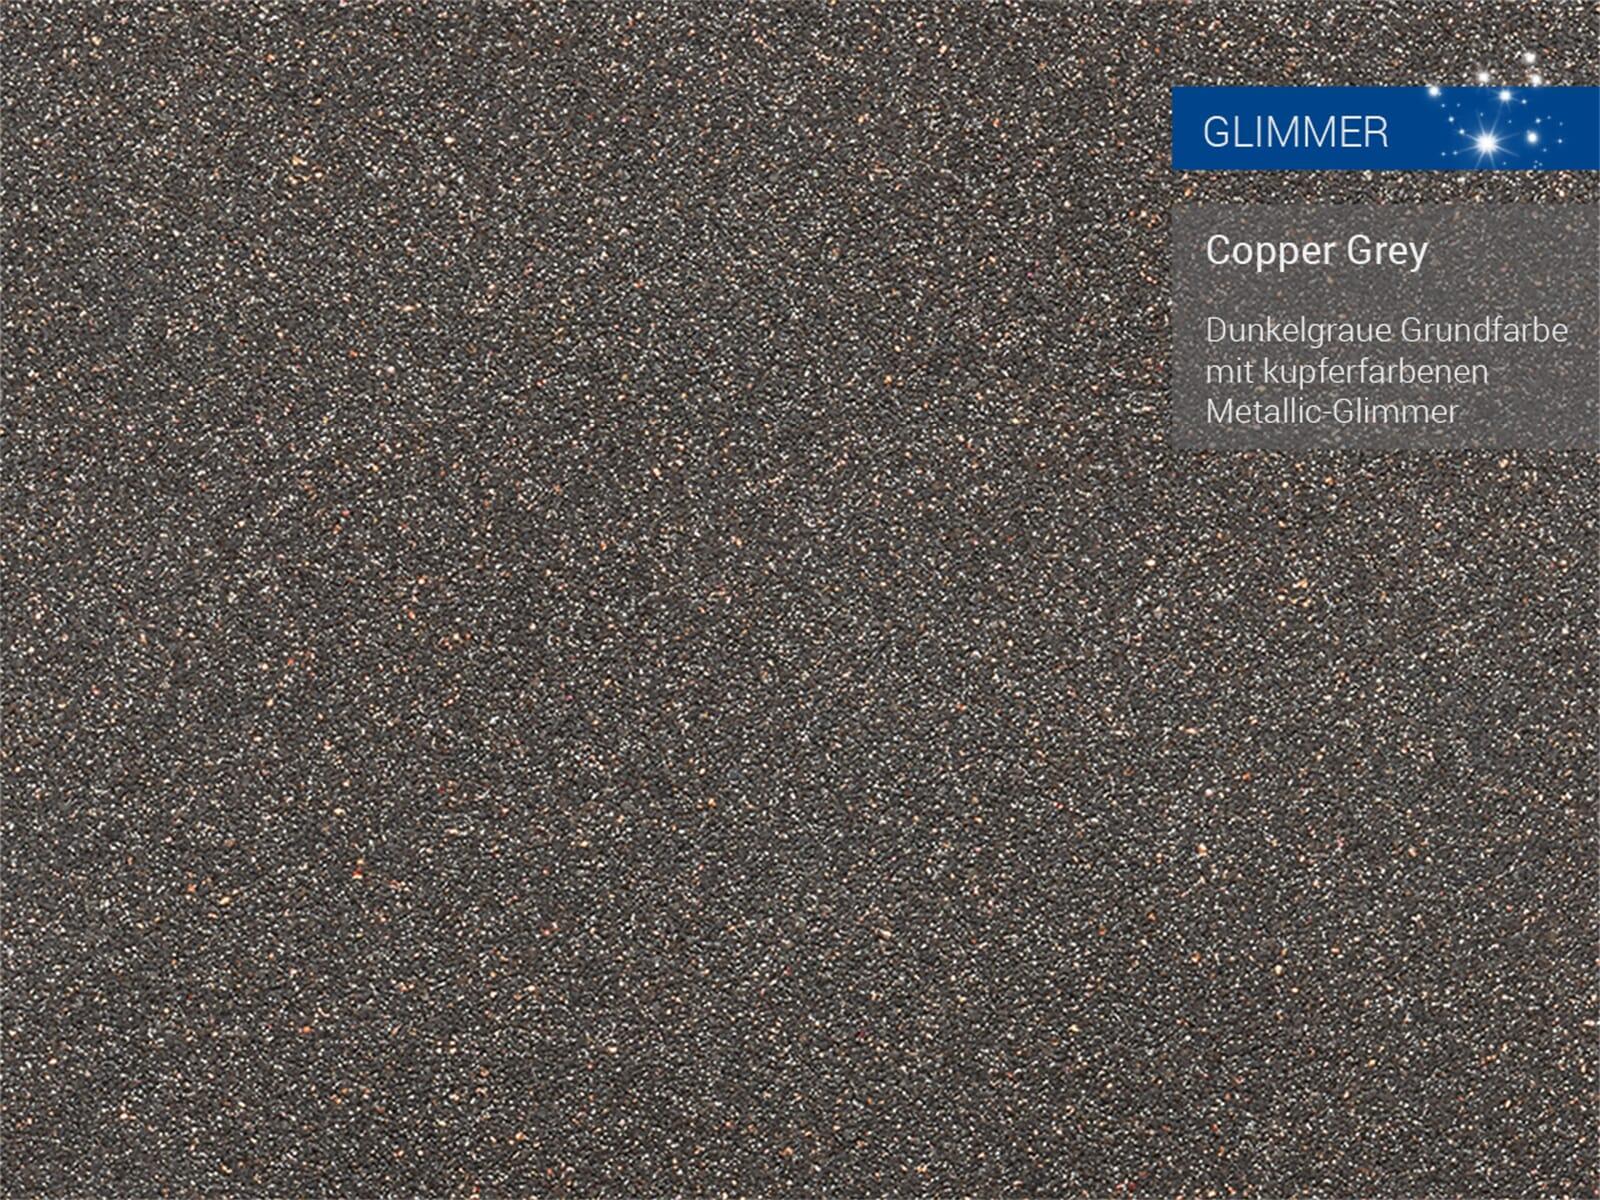 Franke Kubus 2 KNG 110-52 Copper Grey - 11967 Granitspüle Exzenterbetätigung